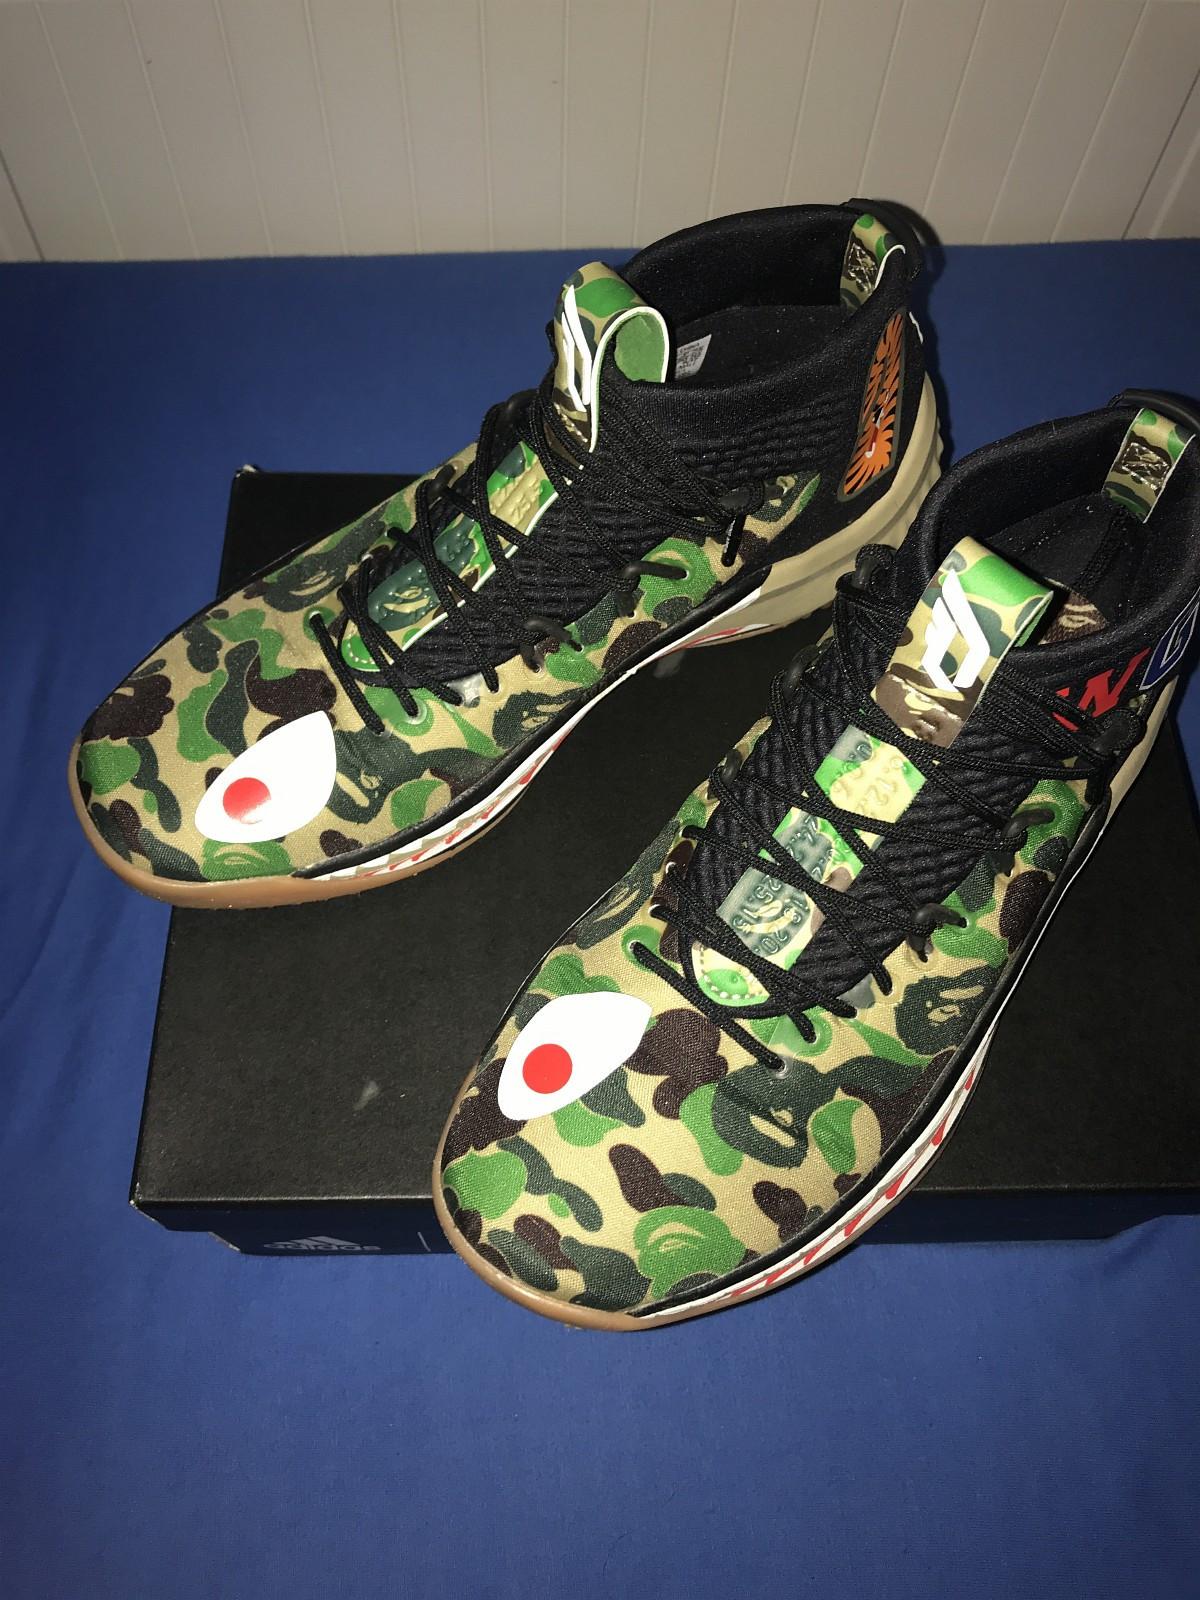 Bape Dame4 sko   FINN.no